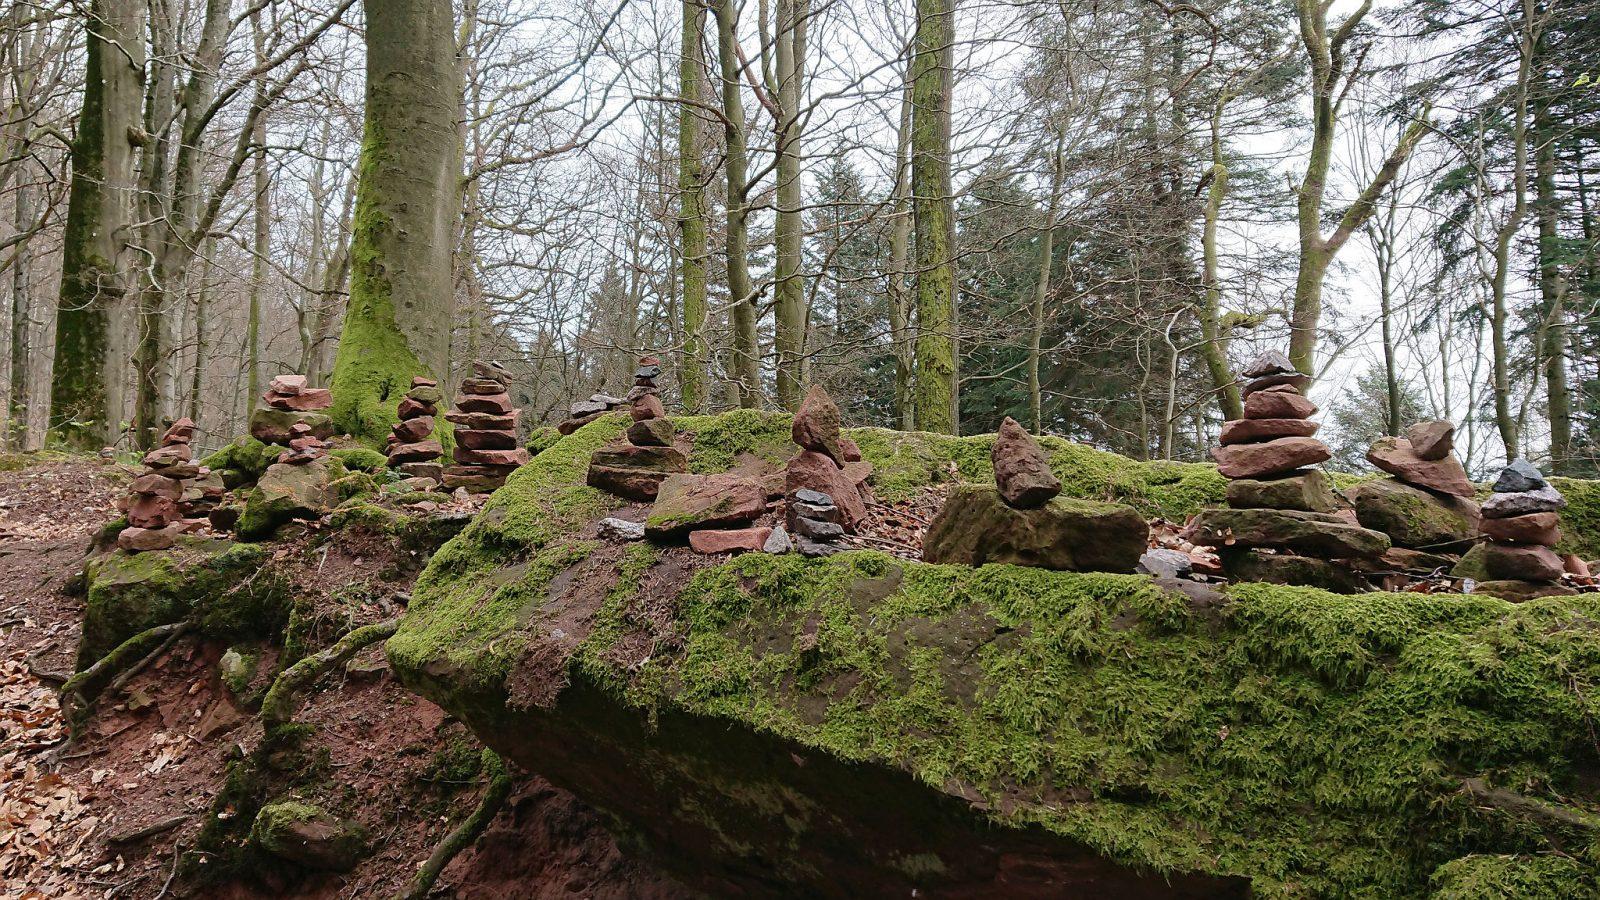 Steintürme säumen den Weg.